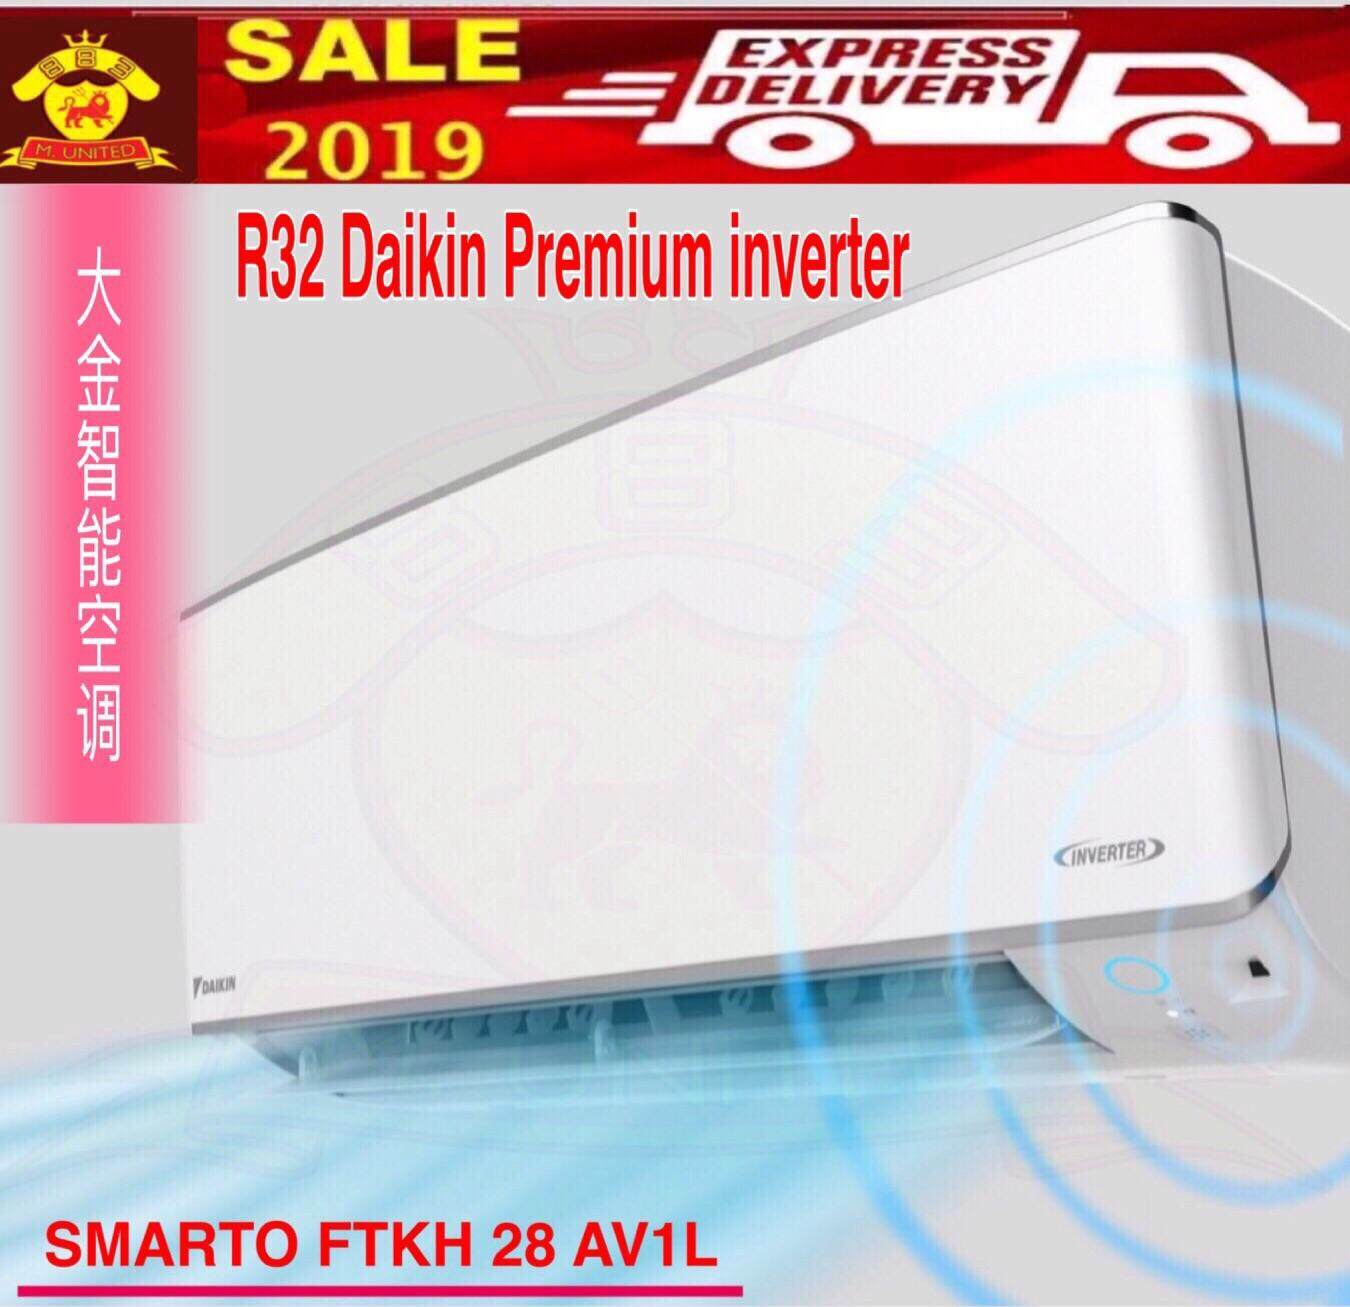 2020 NEW R32 DAIKIN 1.0 HP (FTKH 28 ) PREMIUM INVERTER SMARTO -FTKH SERIES -UP TO 70% ENERGY SAVING